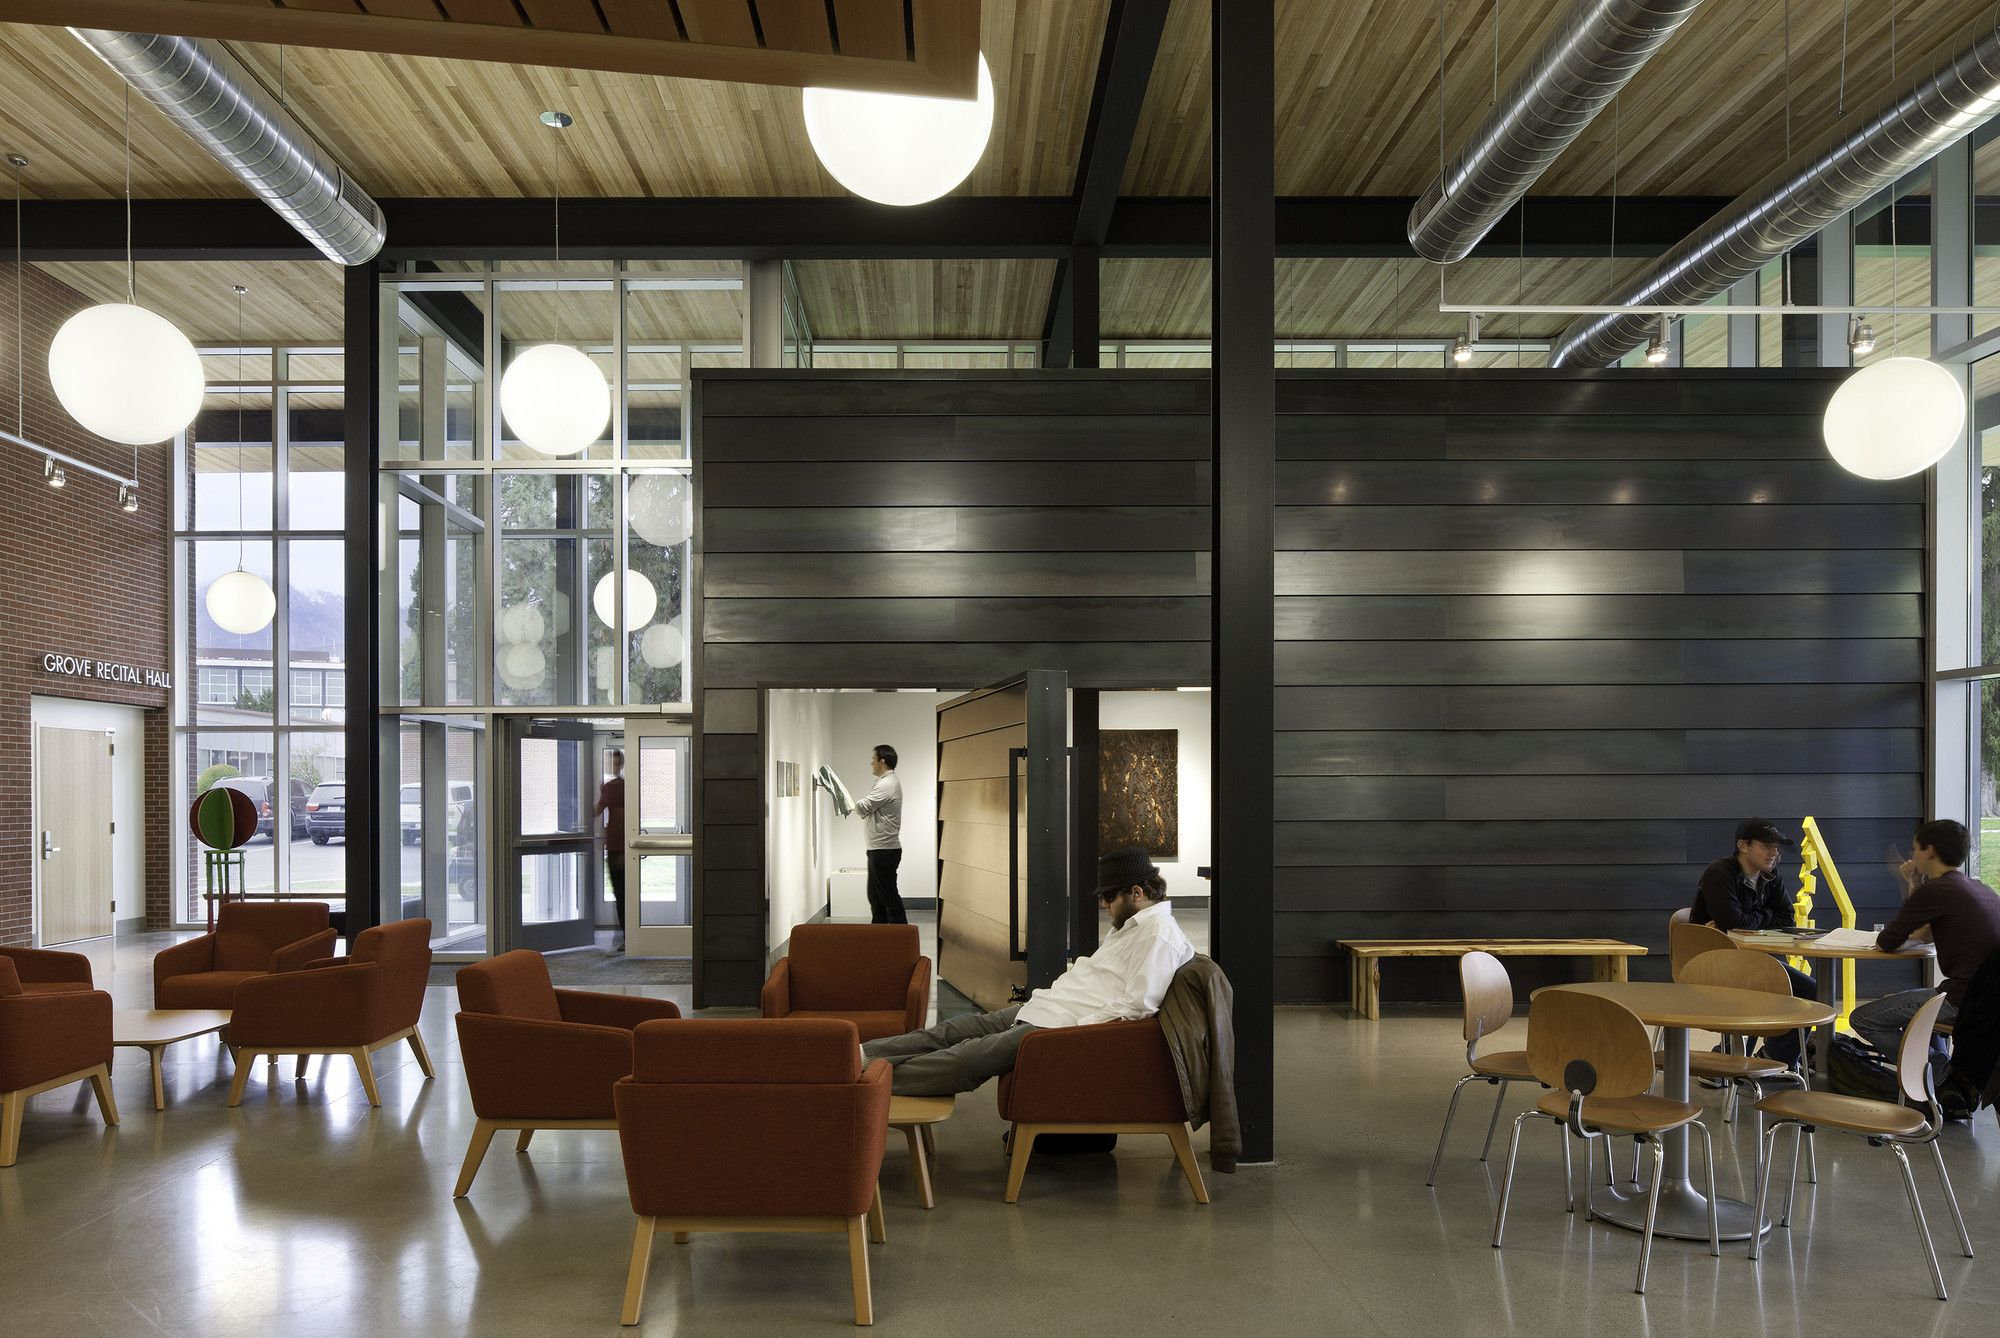 Gallery Of Wenatchee Valley College Music And Arts Center Integrus Architecture 8 Hotel Interior Design Beautiful Interior Design Office Interior Design